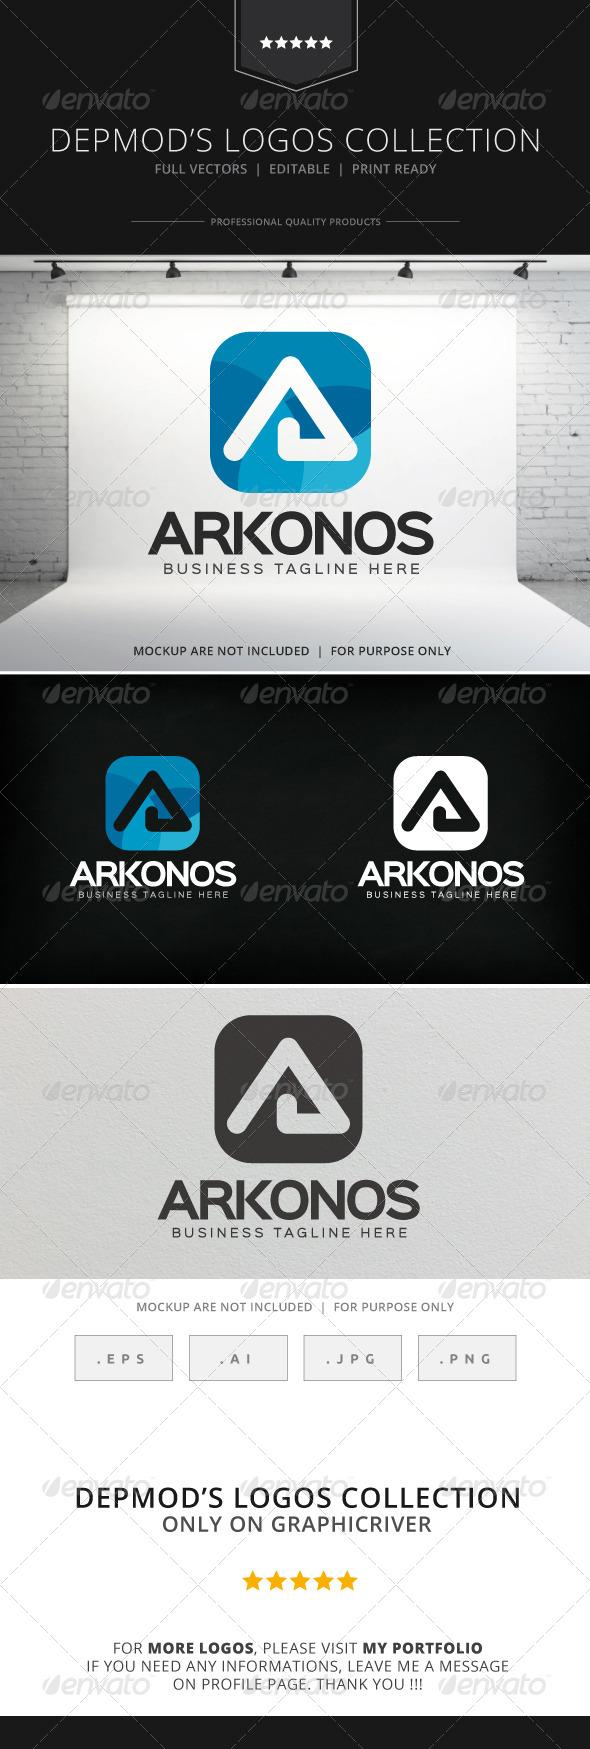 Arkonos Logo